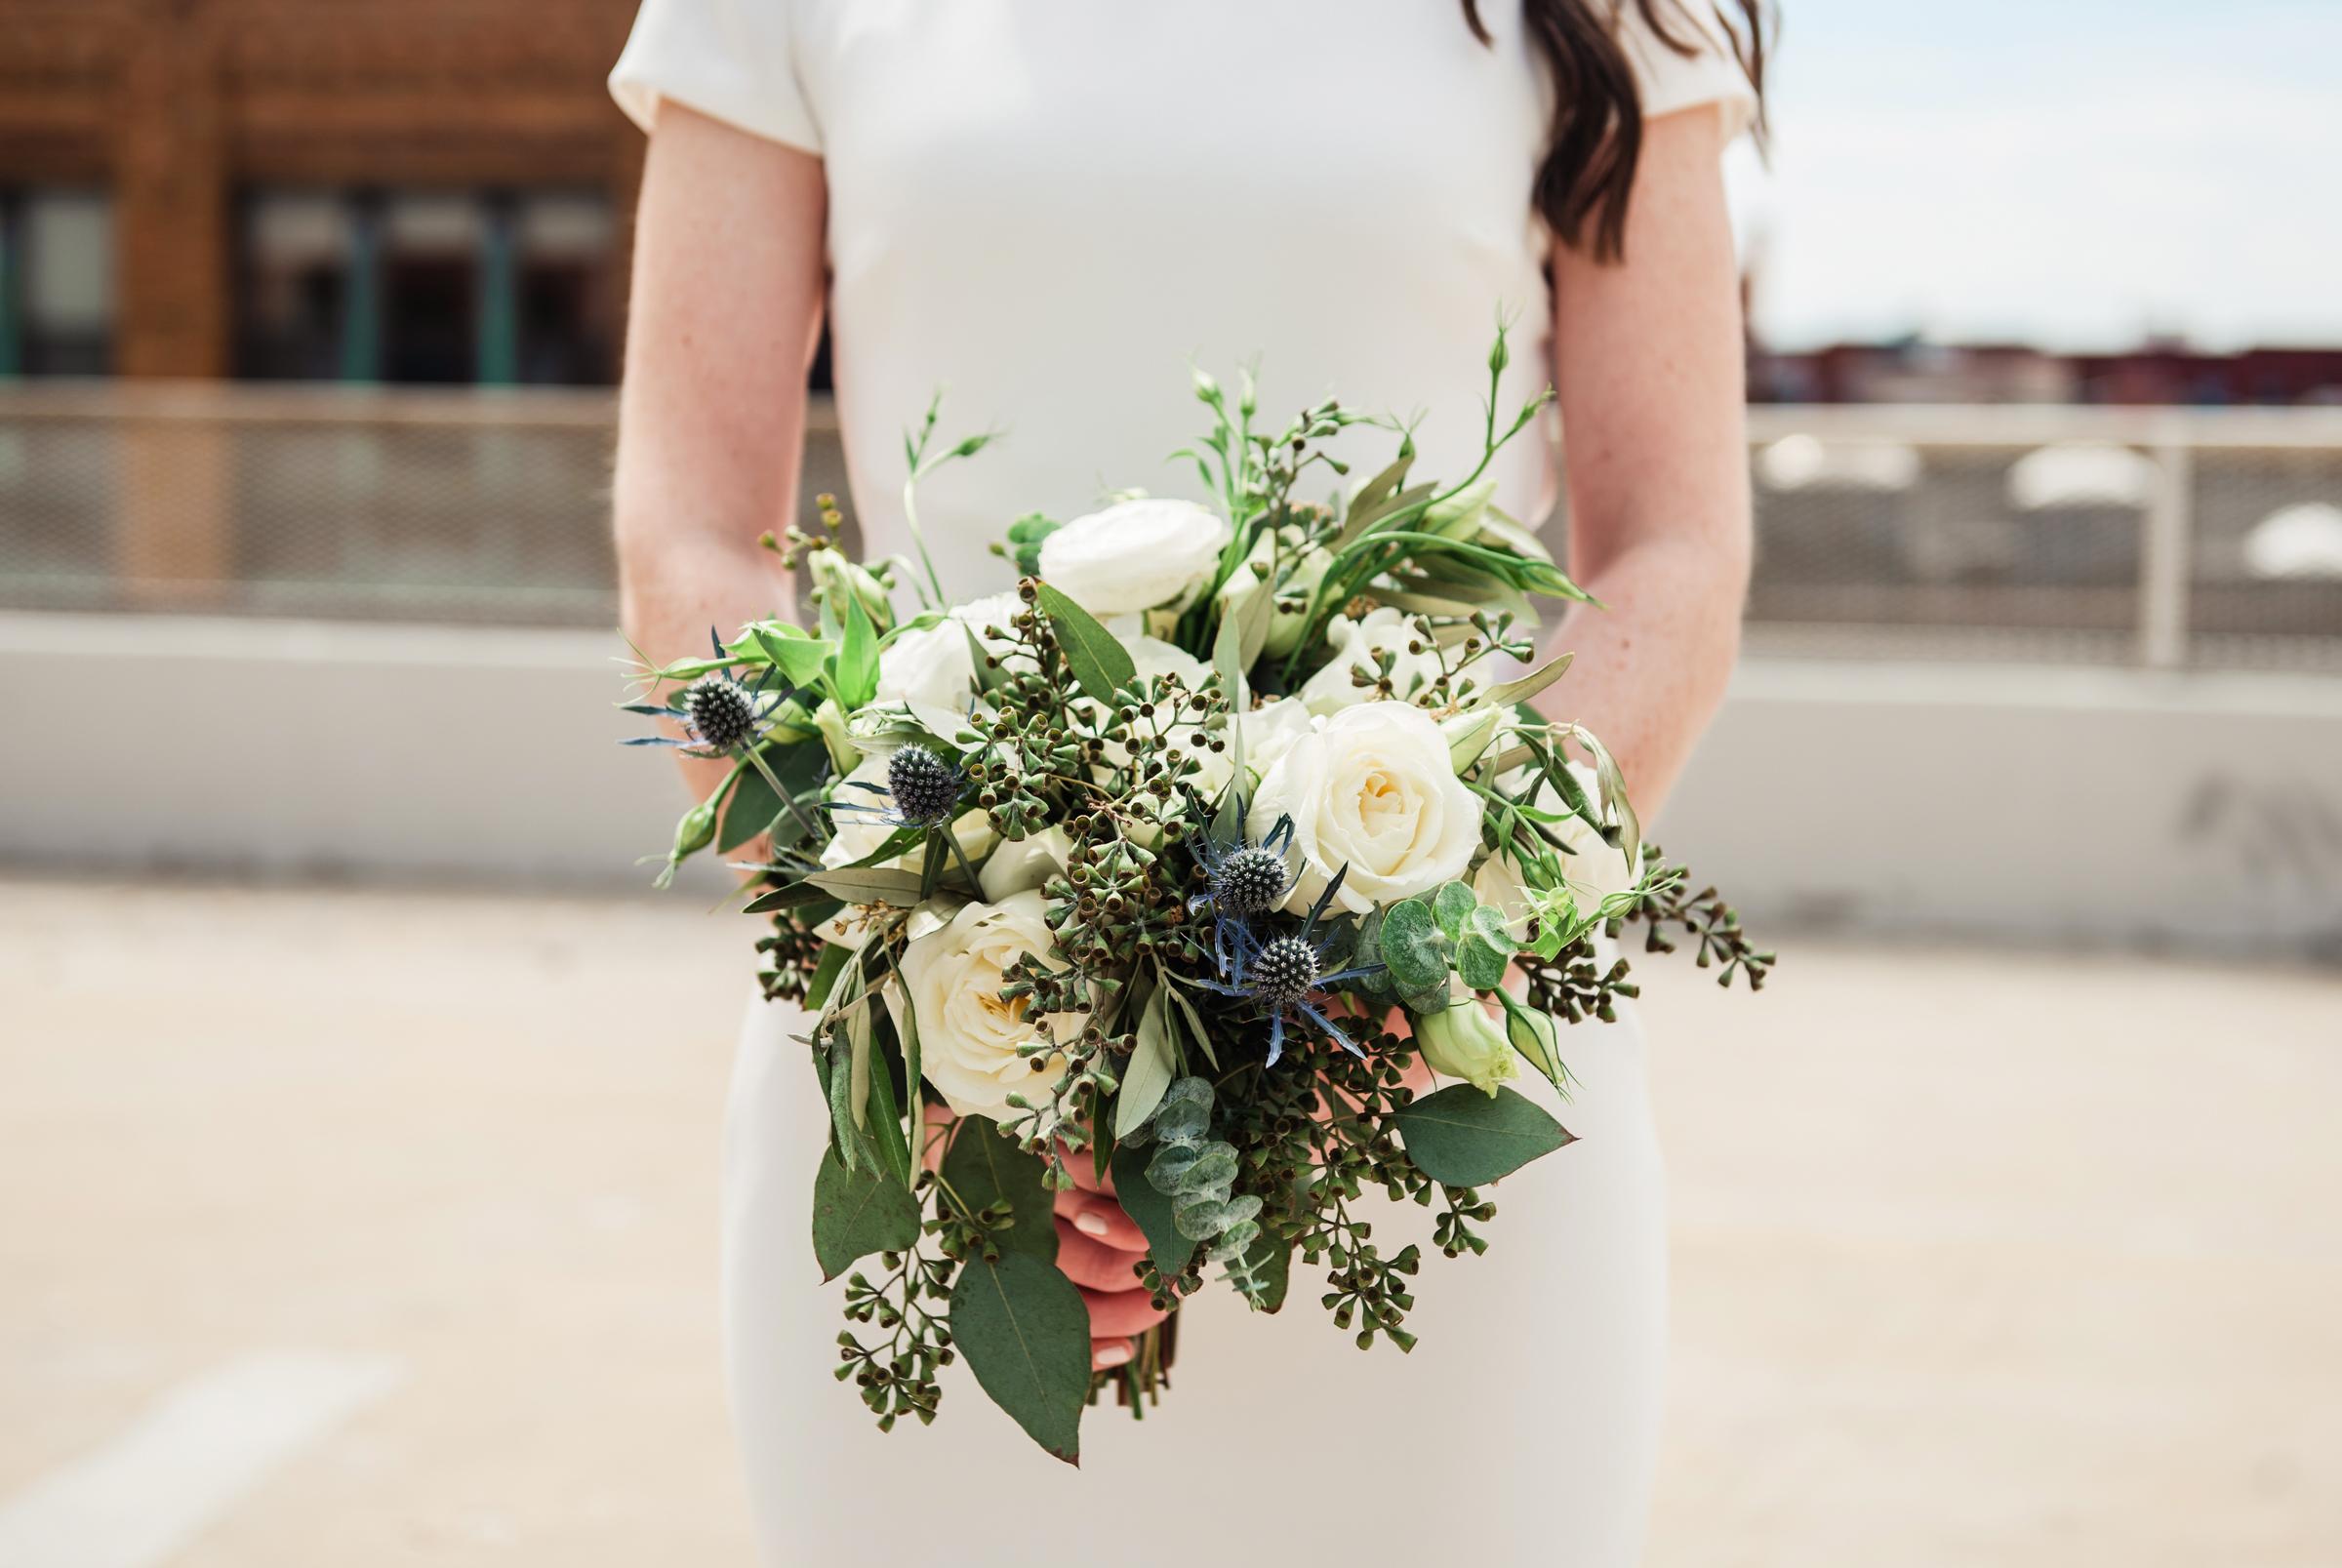 SKY_Armory_Syracuse_Wedding_JILL_STUDIO_Rochester_NY_Photographer_DSC_5285.jpg